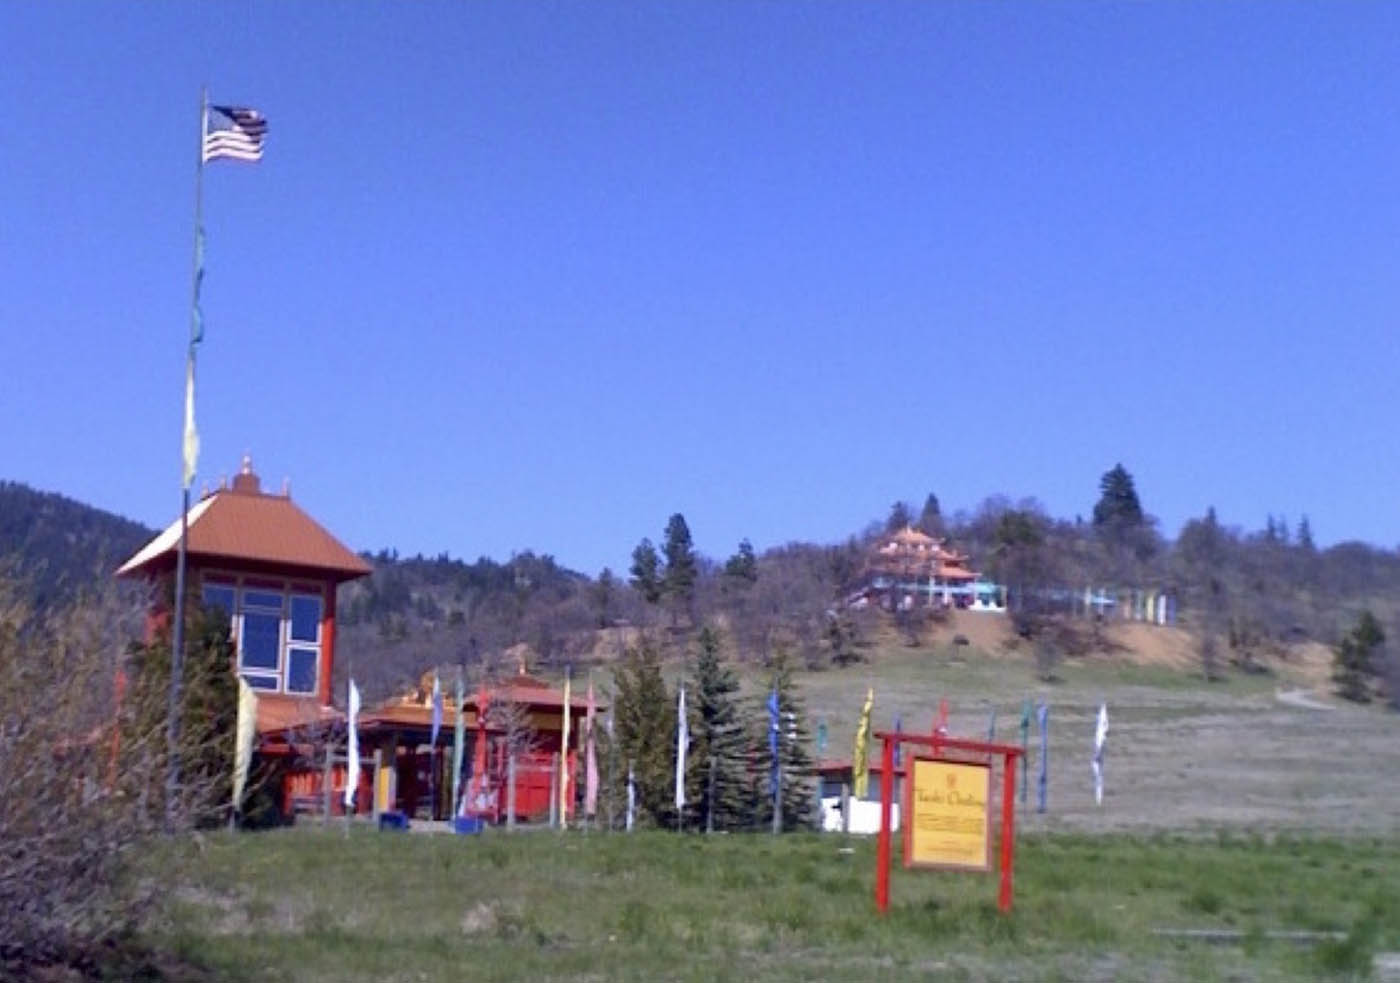 Tibetan Temple in Hilt, California